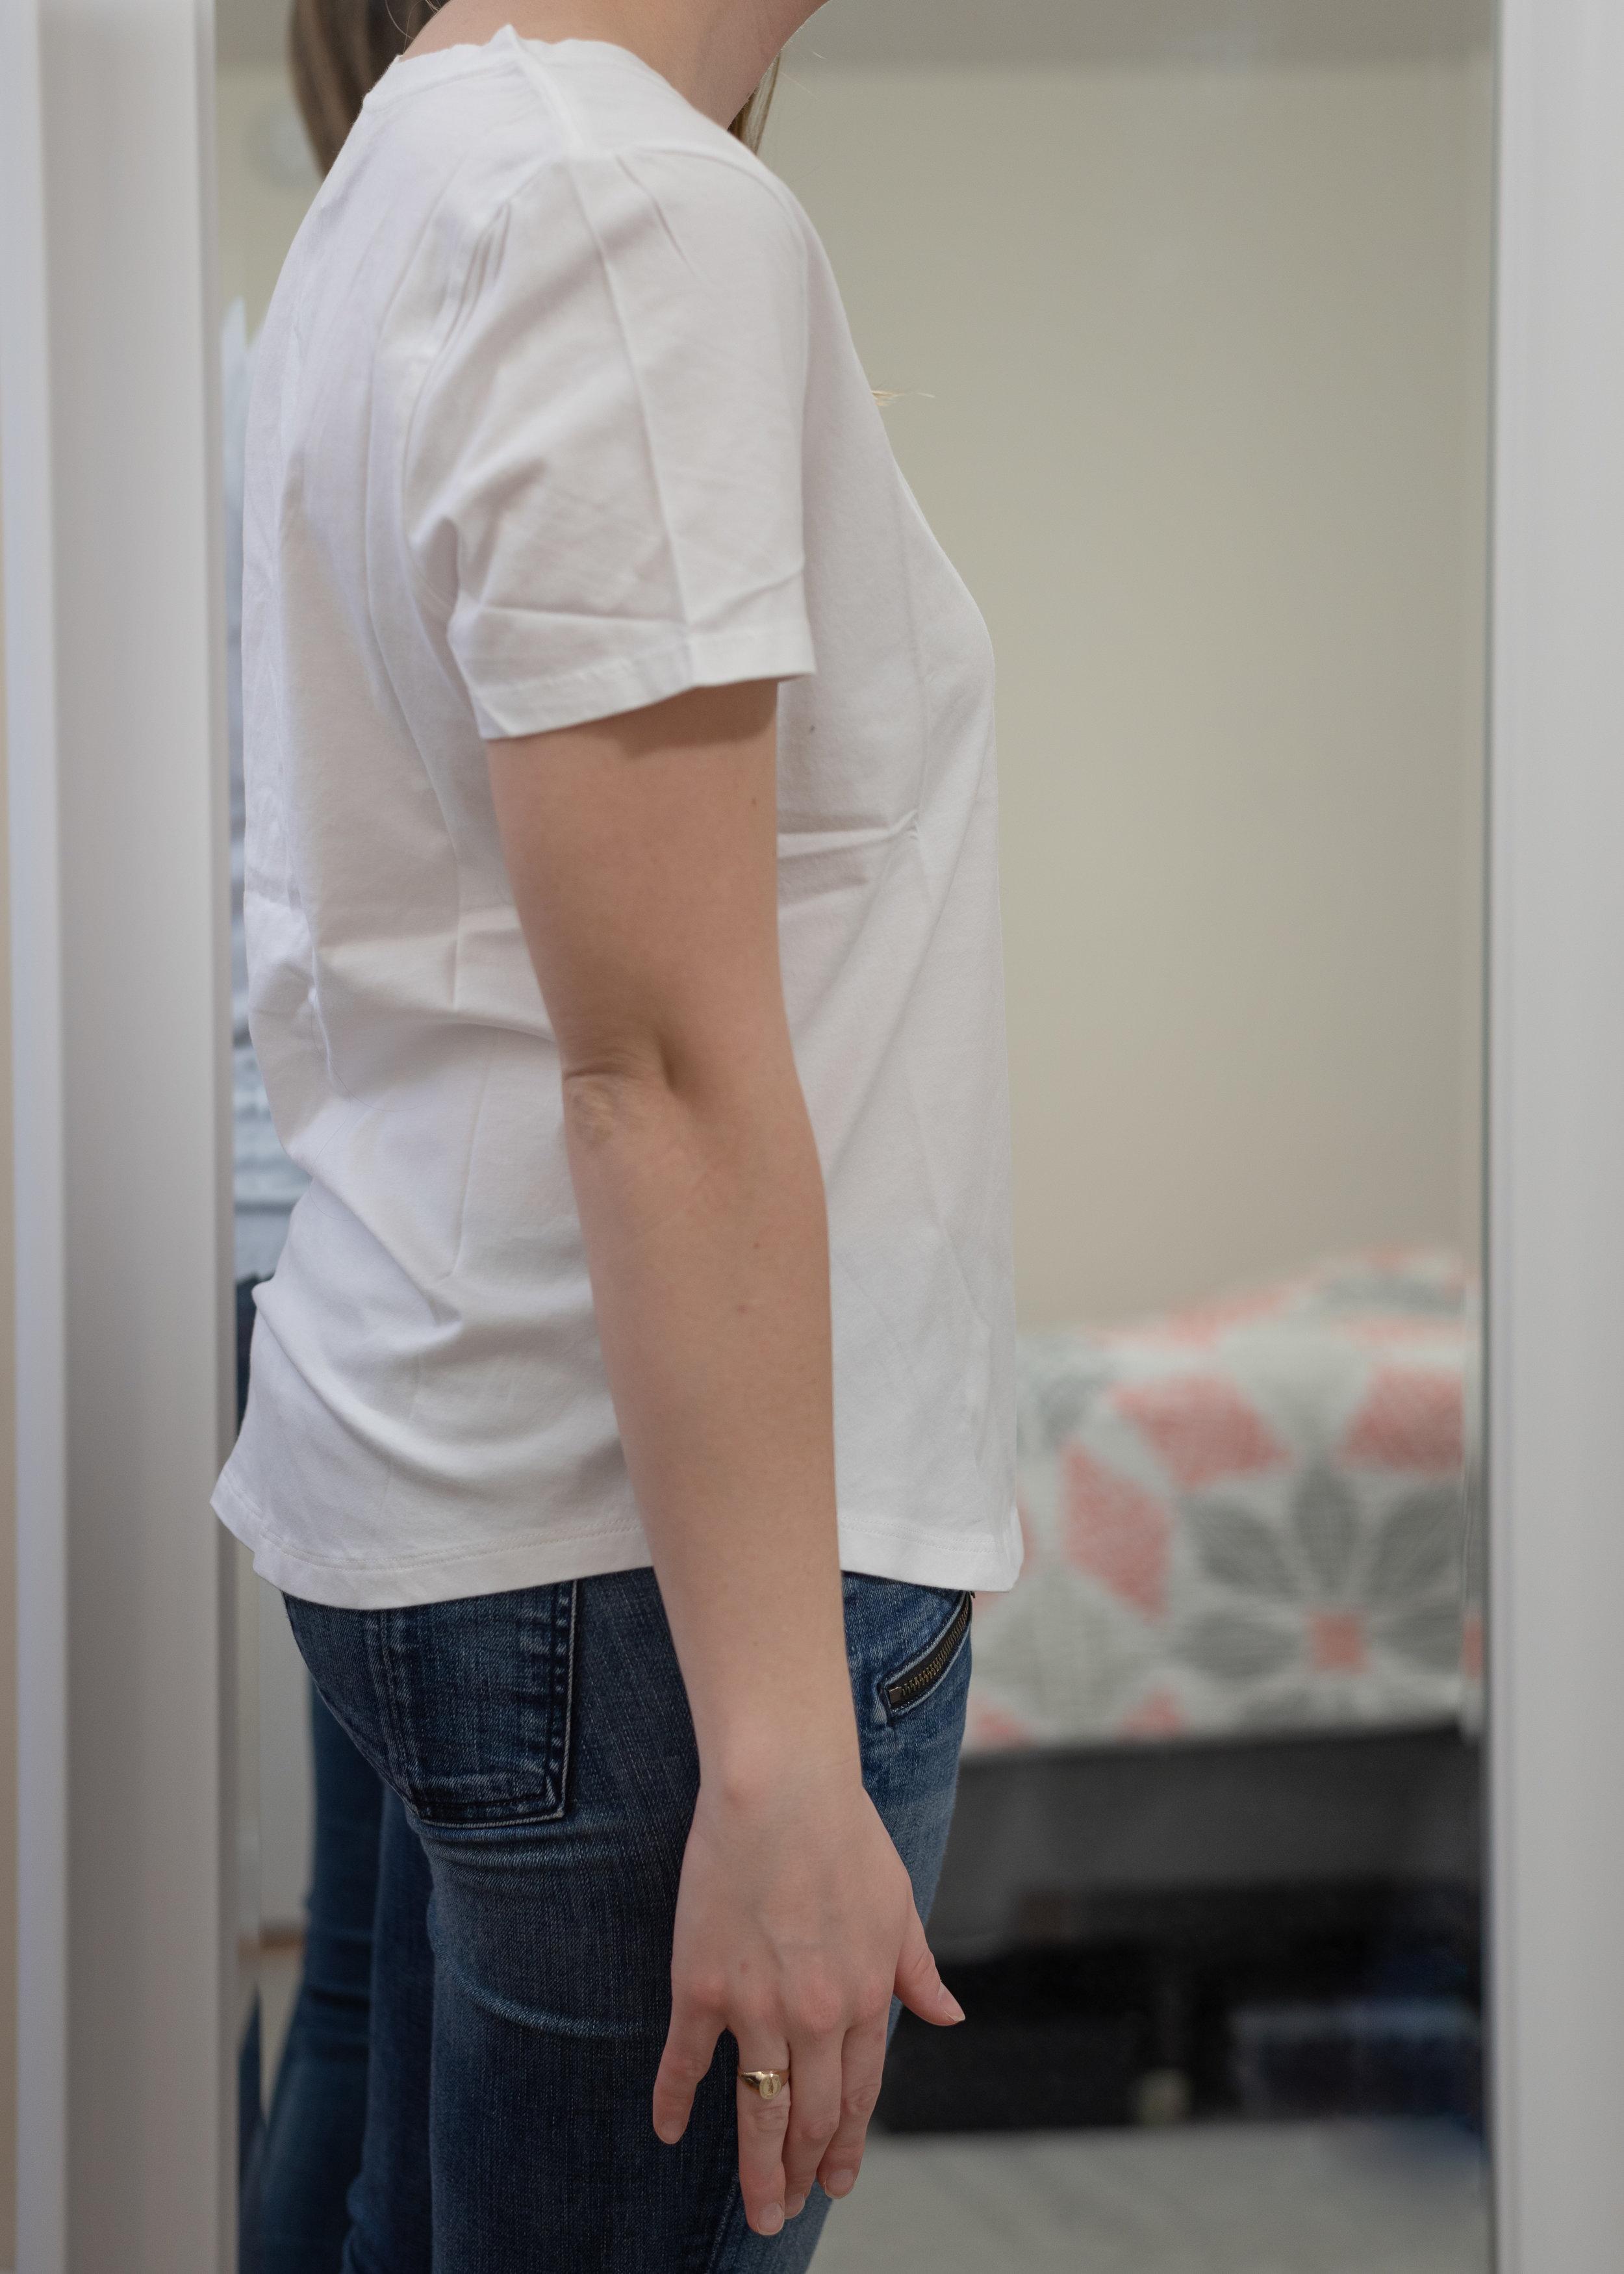 Banana Republic Petite Supima® Cotton V-Neck T-Shirt - Size Petite Small (link to regular size since petite sold out)